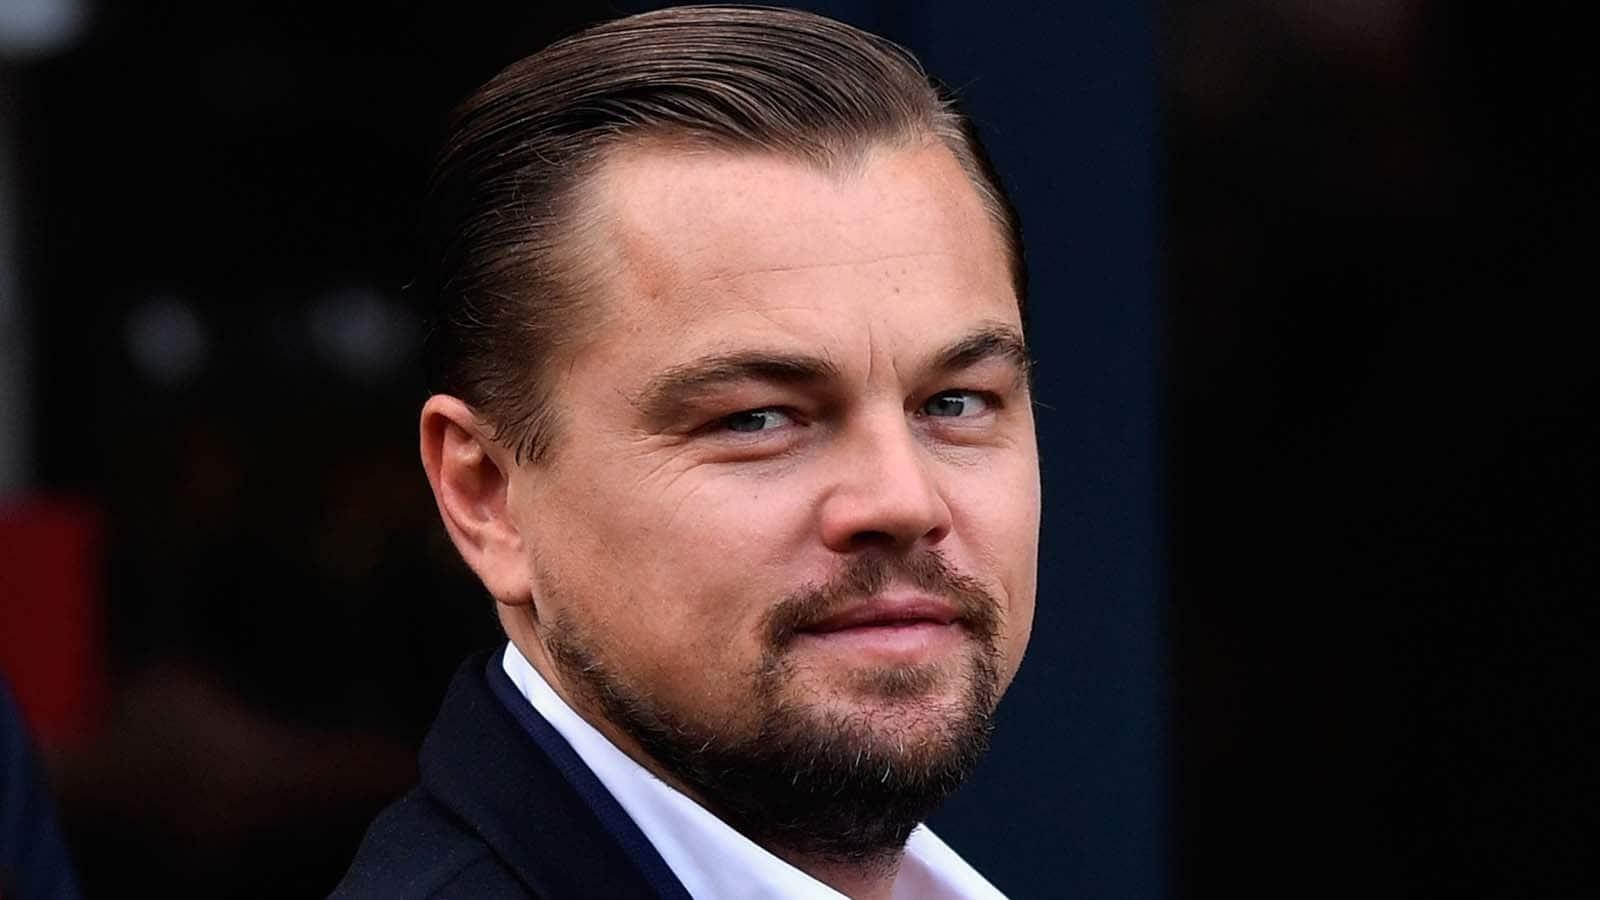 Leonardo Dicaprio Wants To Portray Stan Lee In Biopic